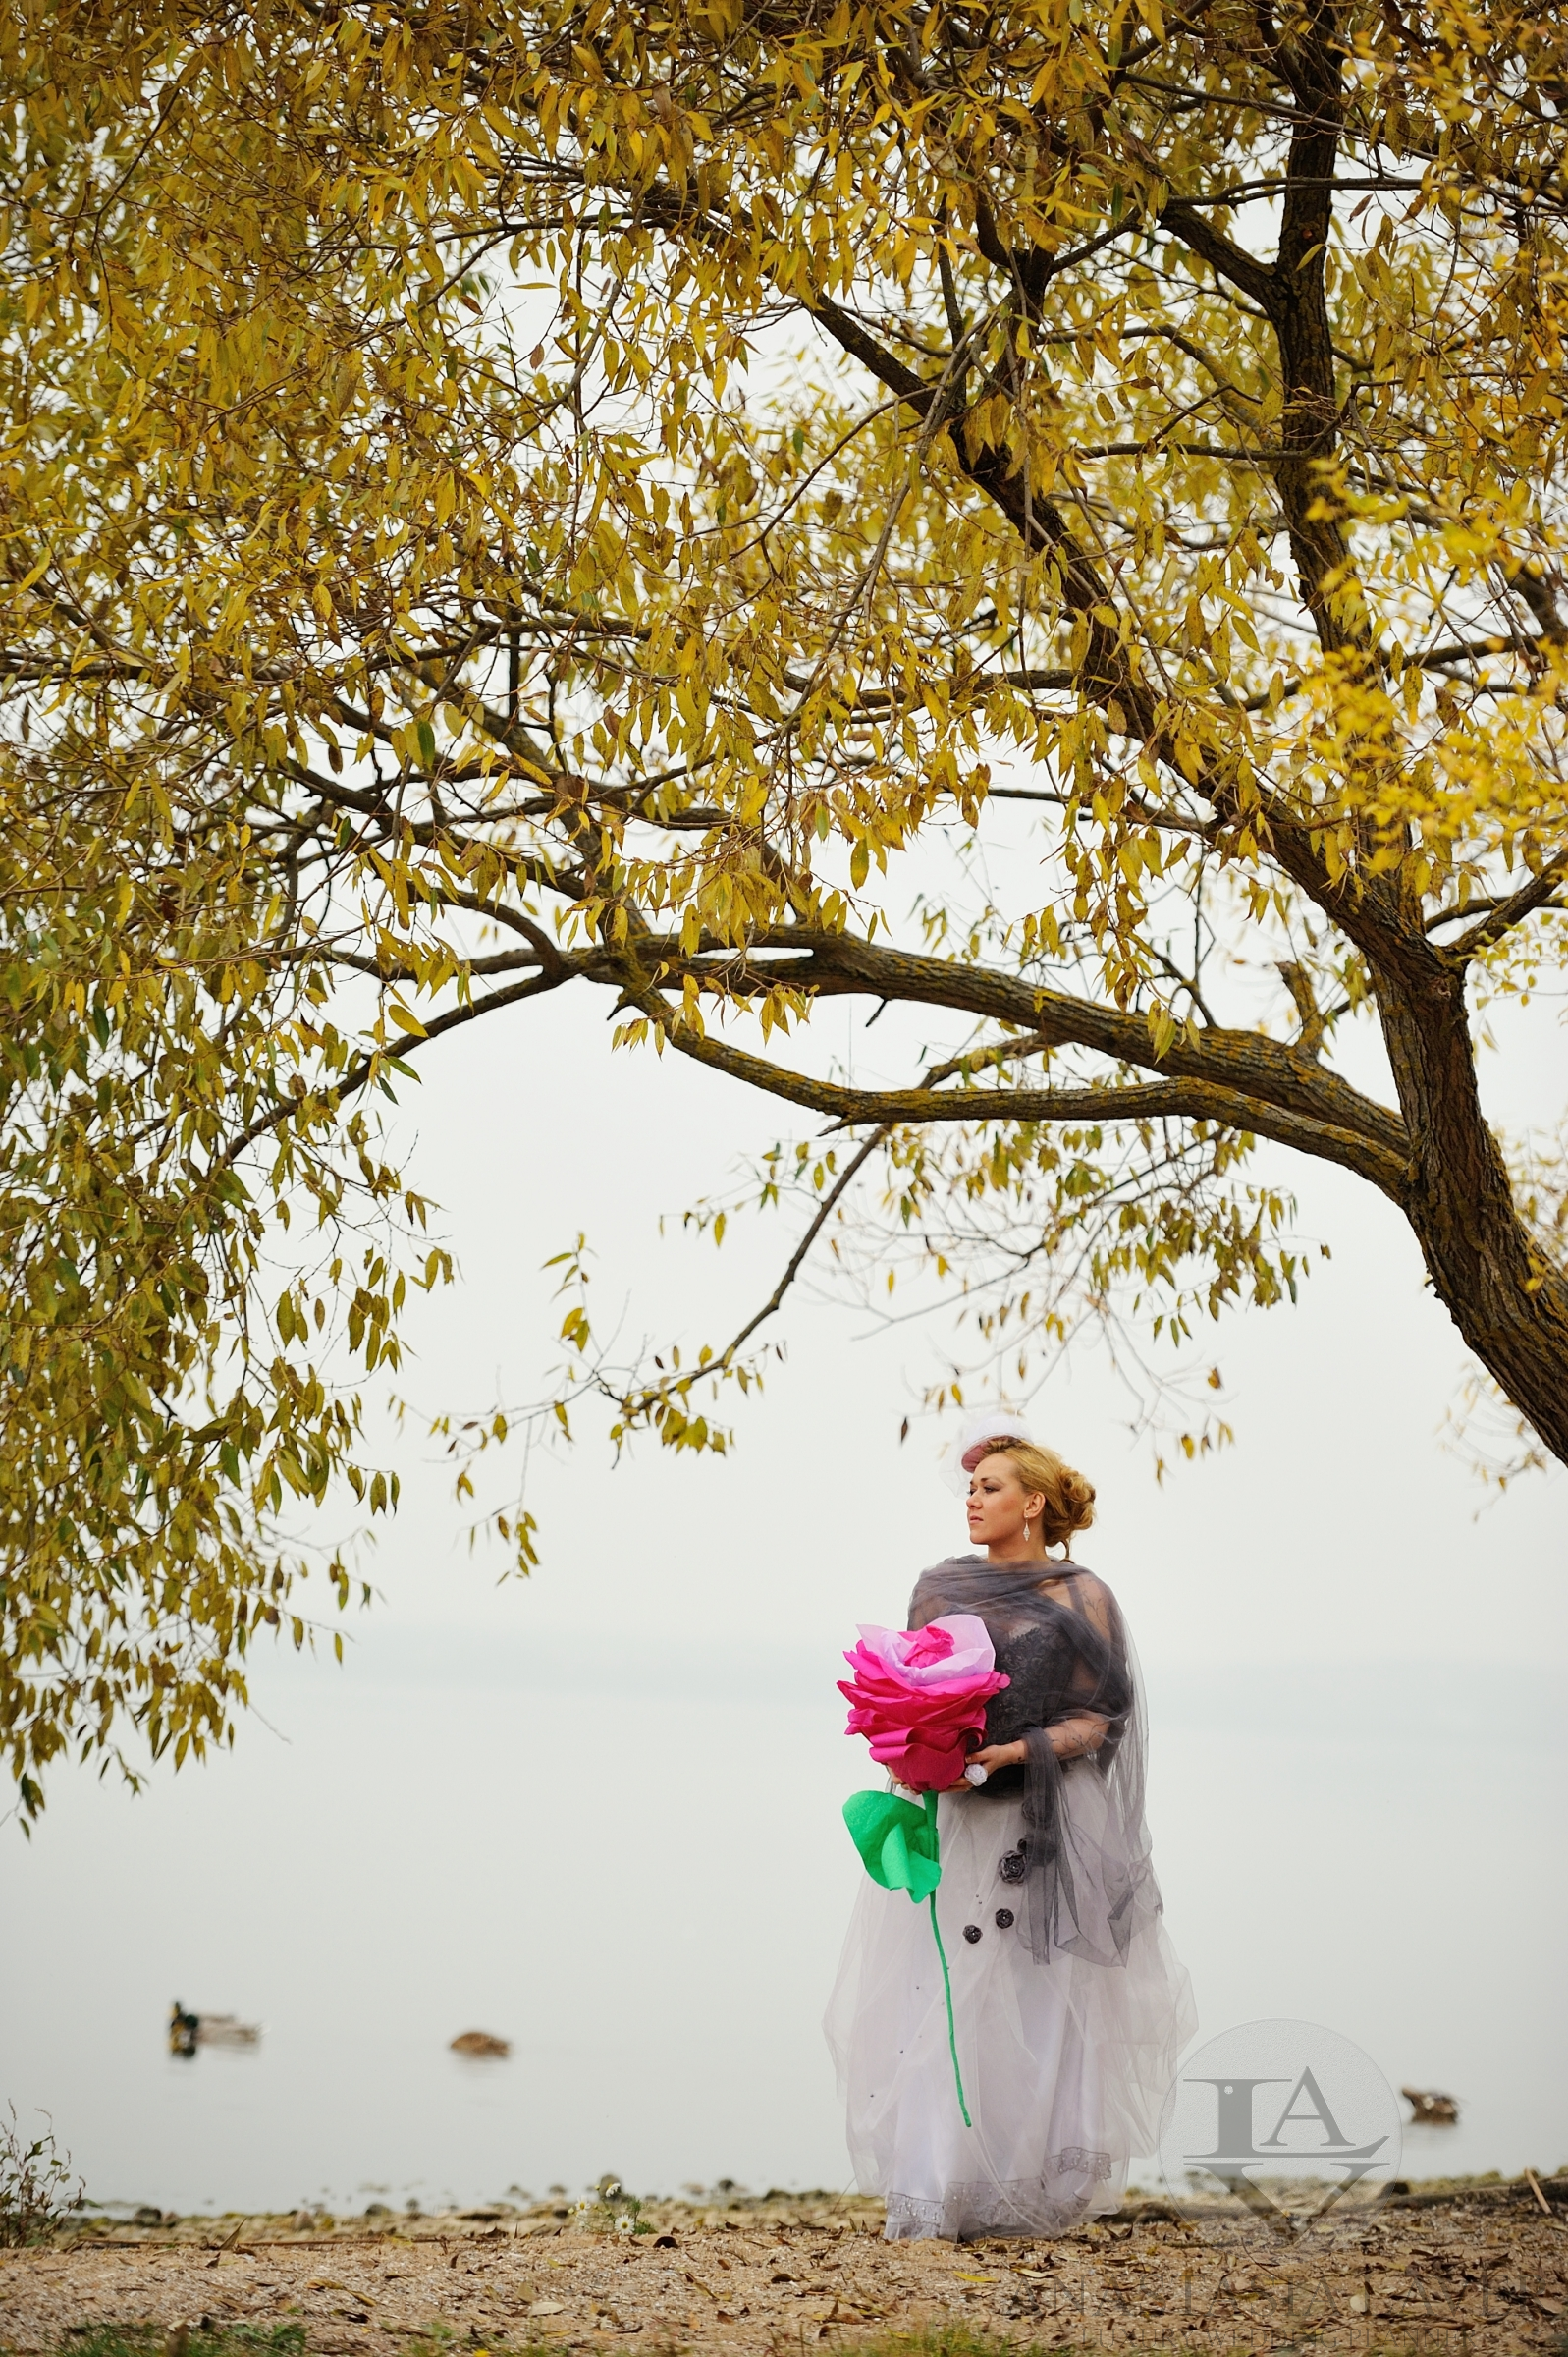 Фантазии о будущем.....  #weddingvip #follow #celebration #bride #love #свадьбаотанастасиилавер #party #weddingparty #Minsk #Moscow #celebration #happy #fantasy #dreams #flowers #rose #LAVER